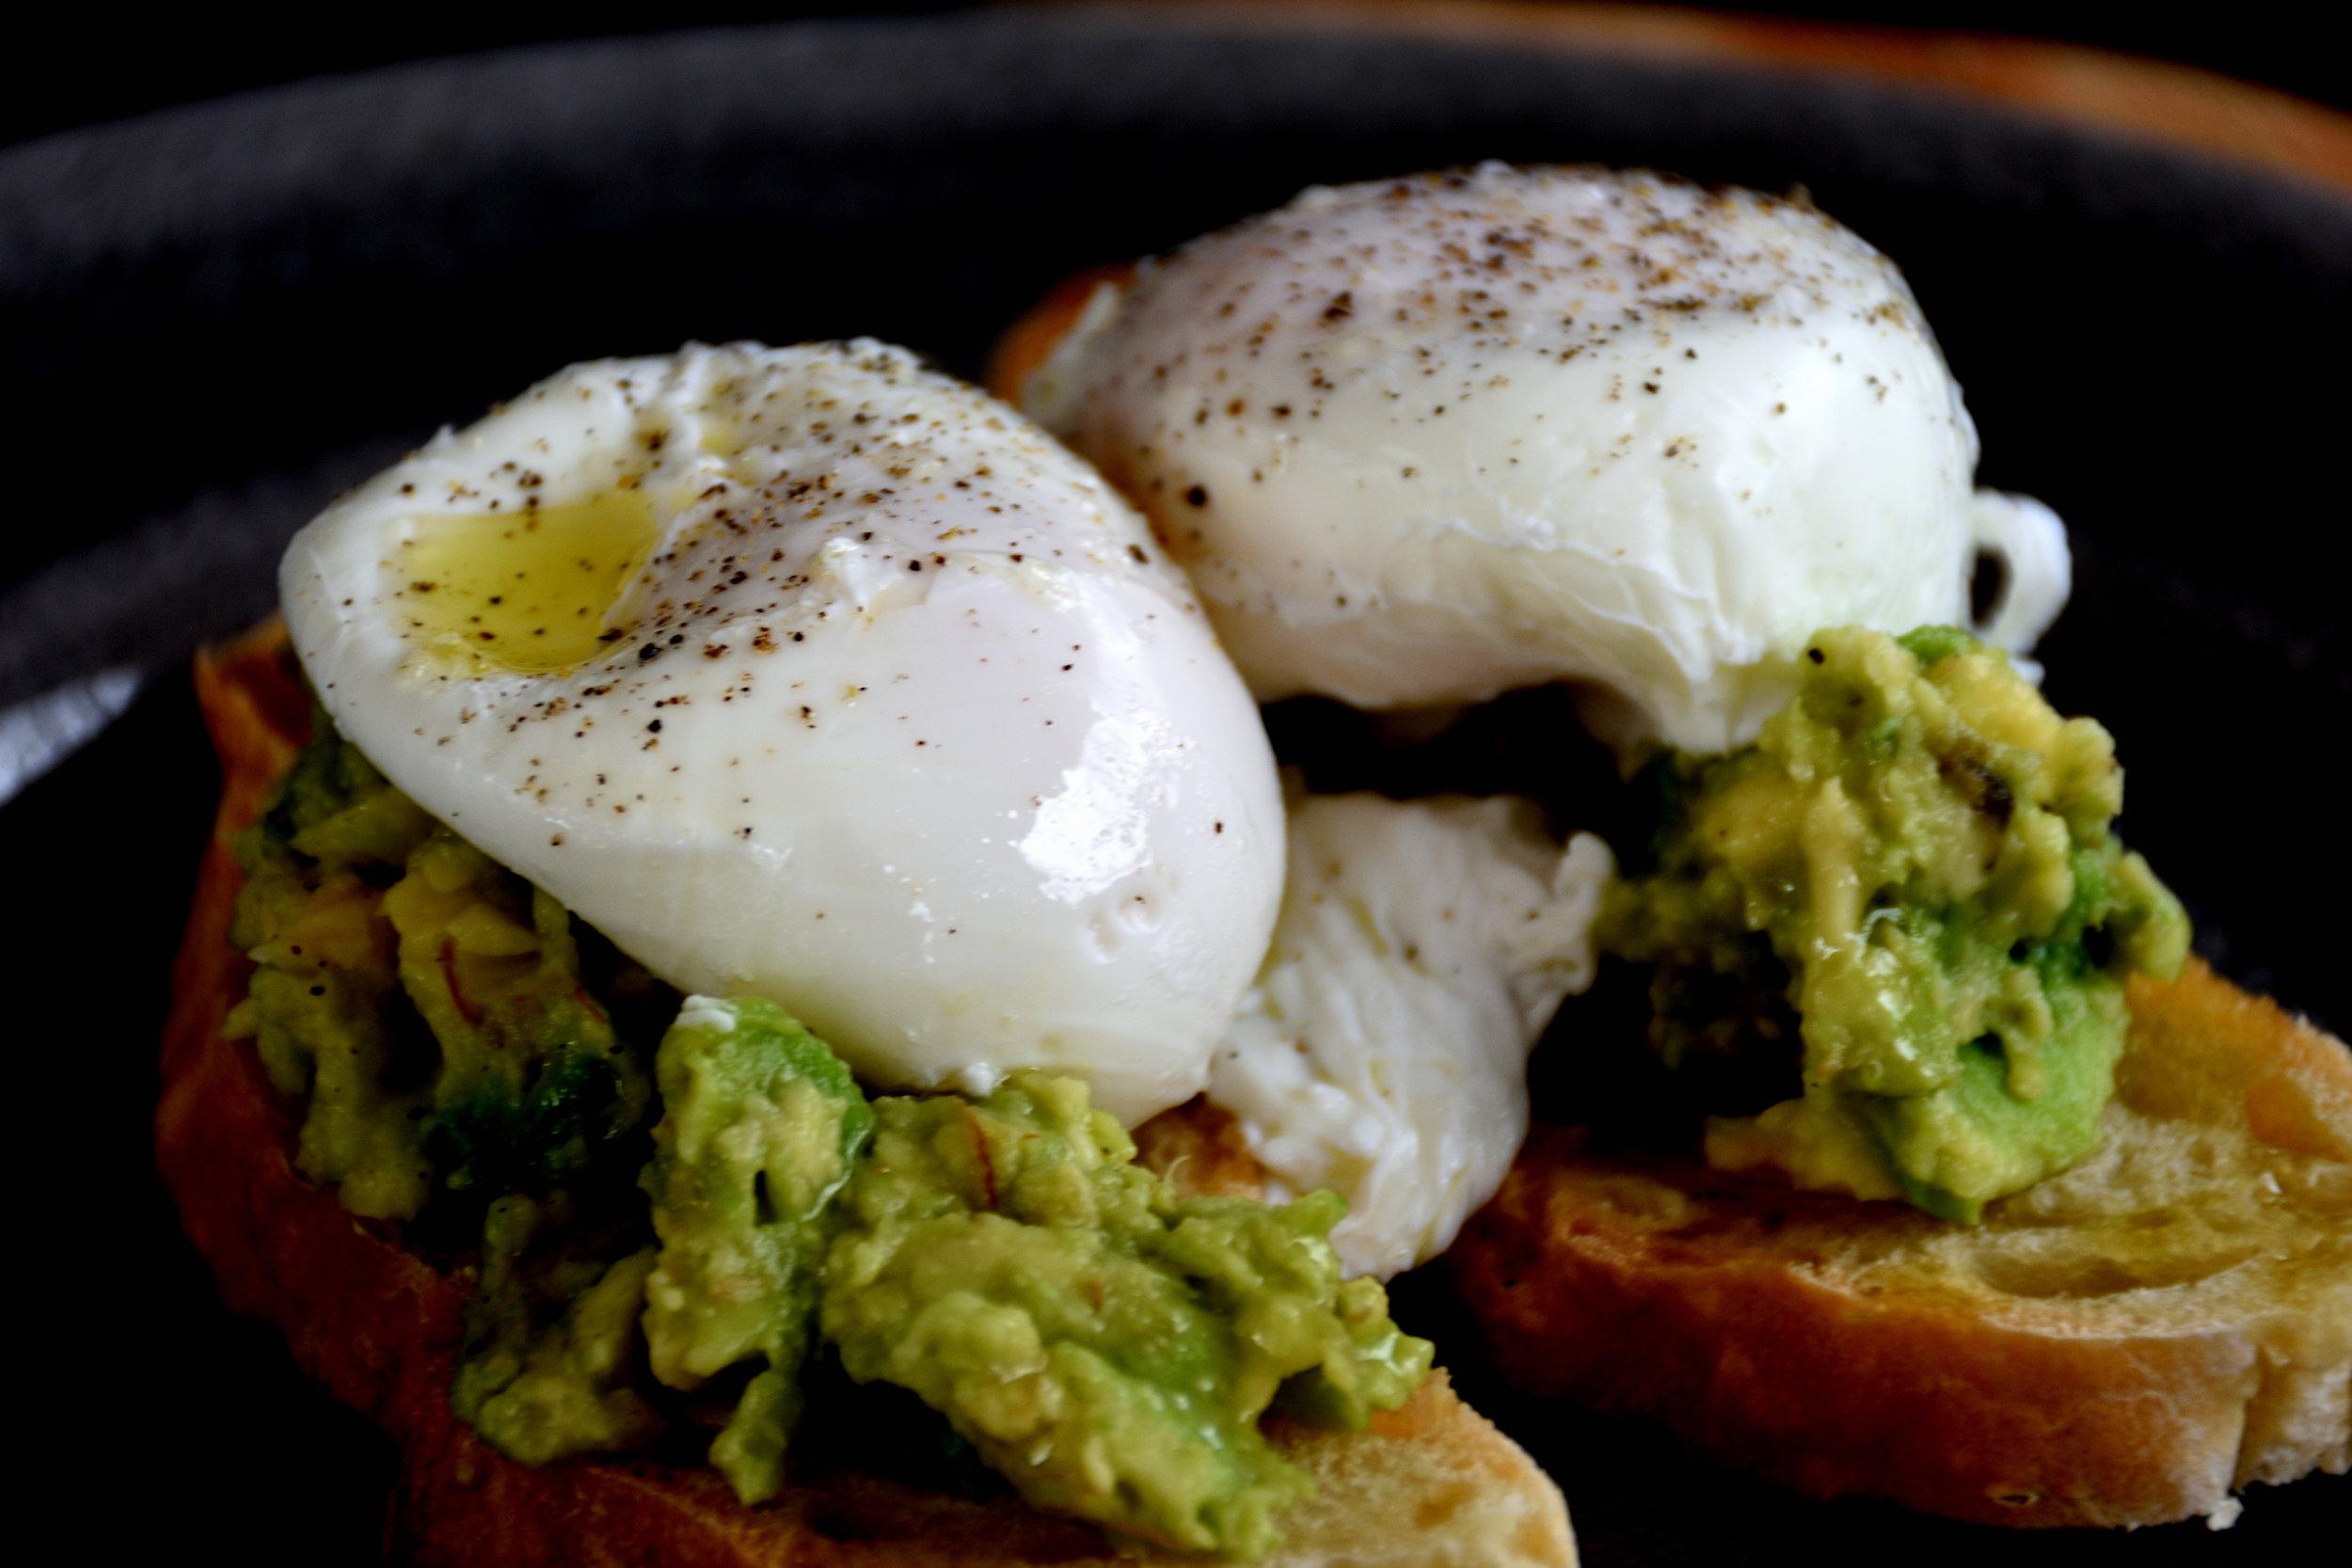 Poached eggs on mashed avocado sandwish.